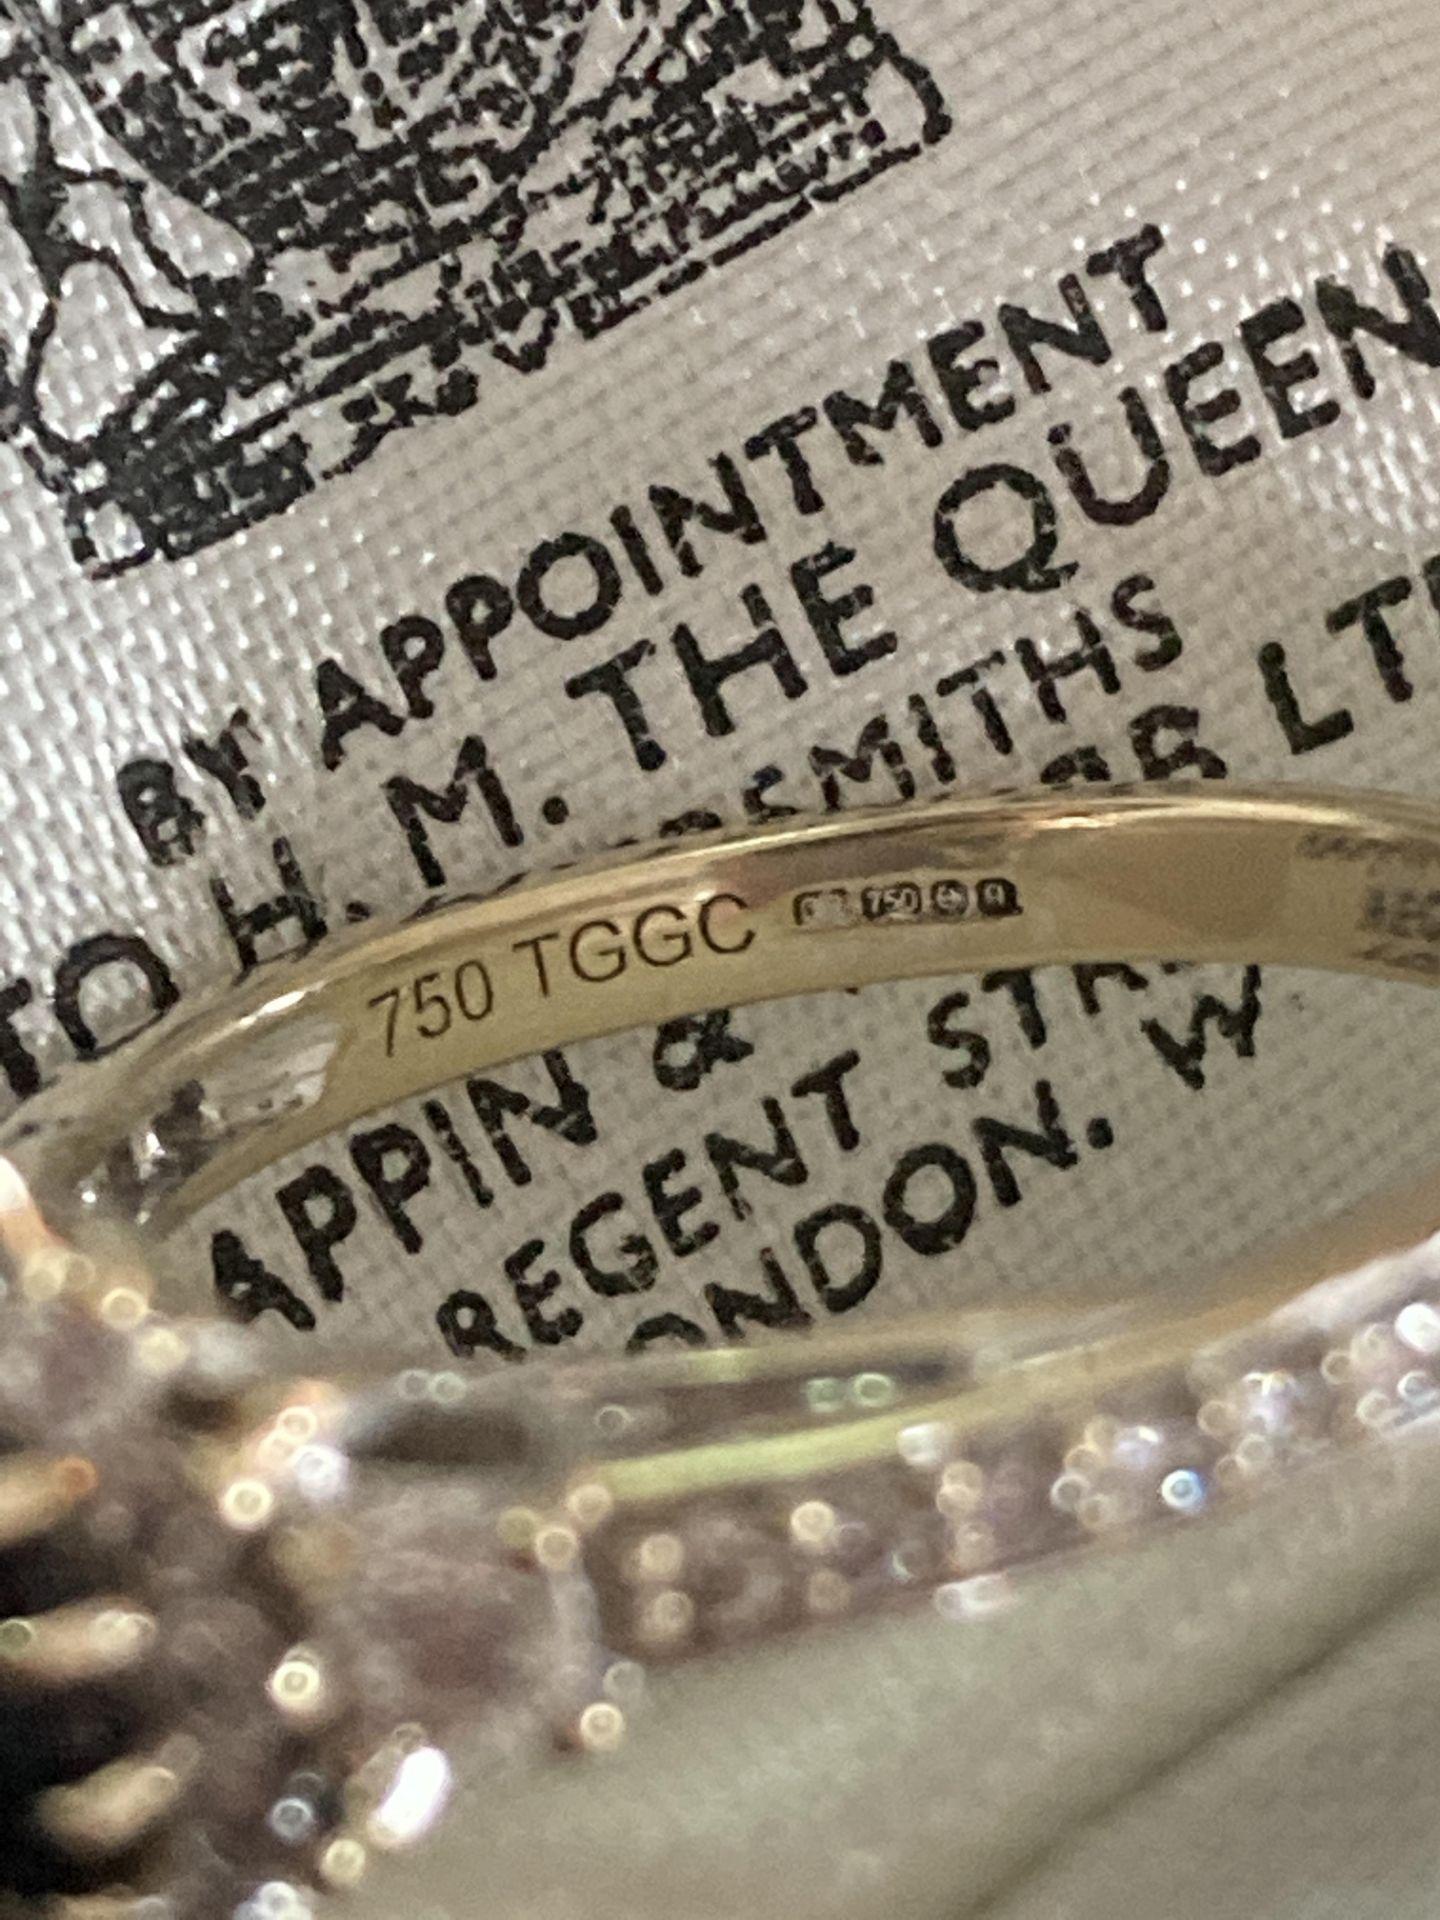 18K GOLD DIAMOND & SAPPHIRE RING - SIZE N /12 - Image 6 of 6